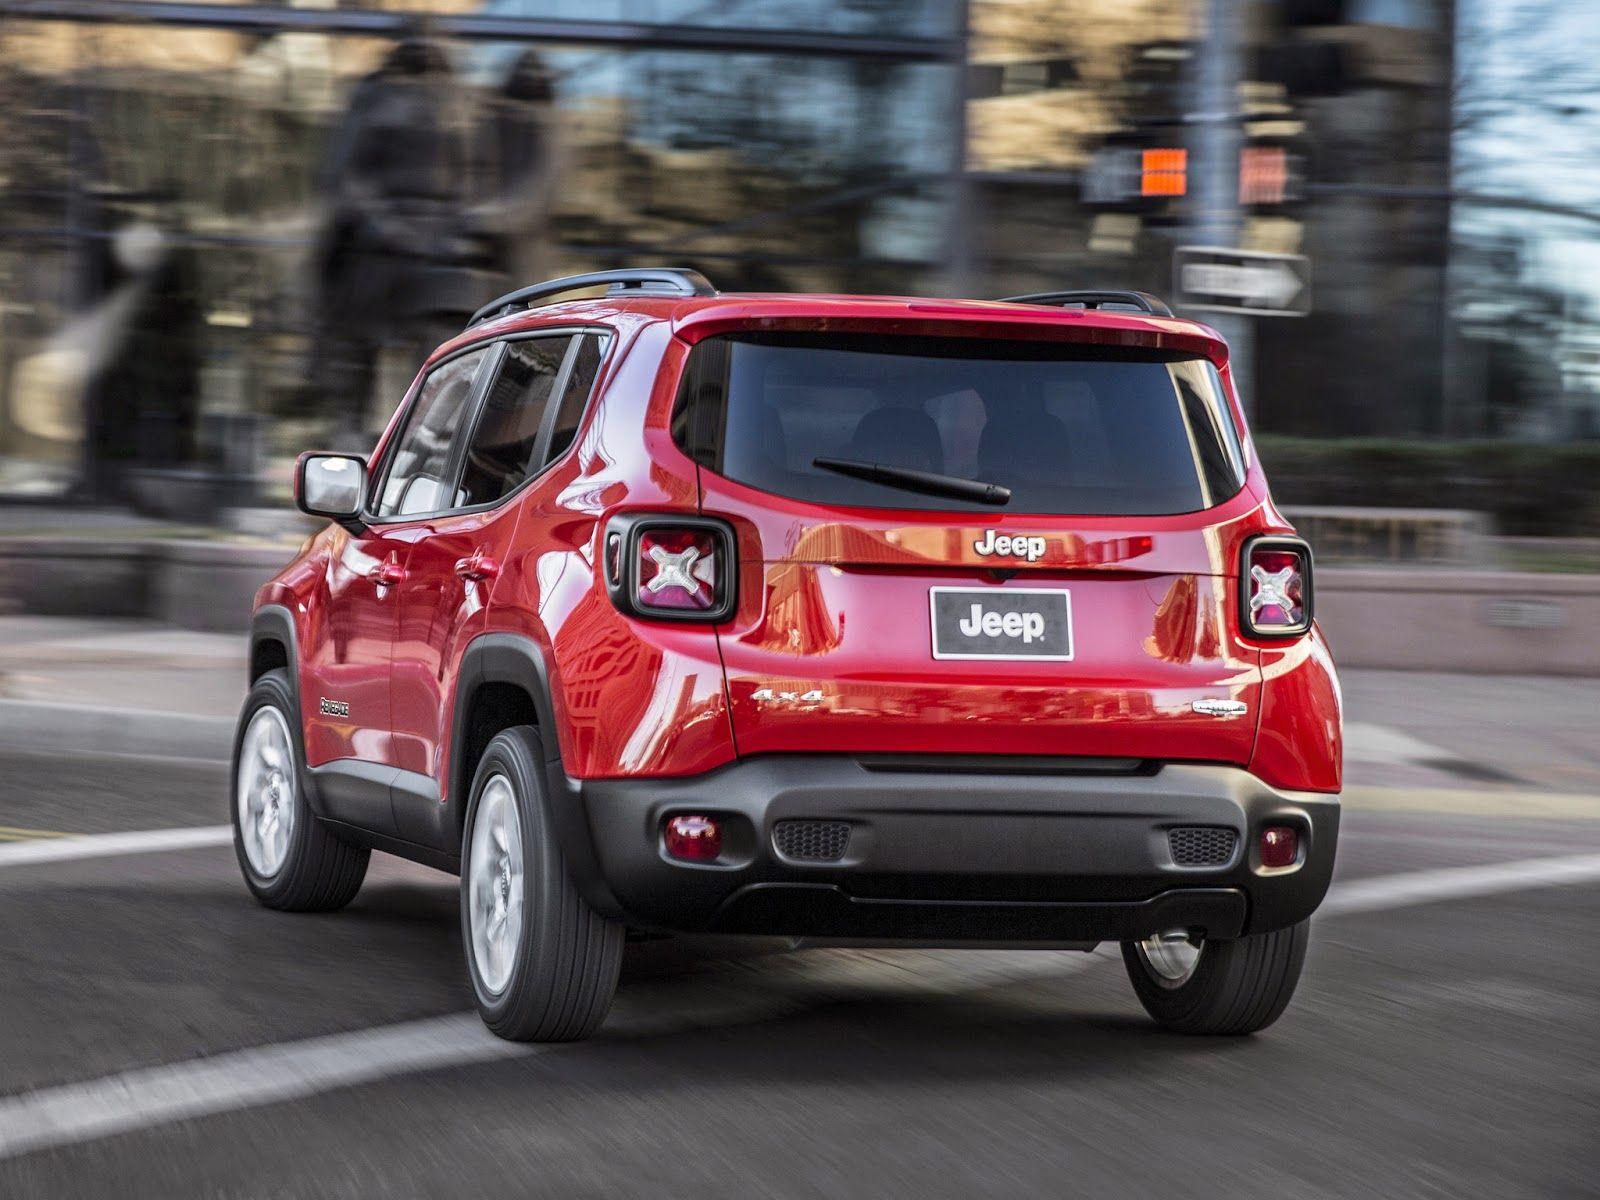 Novo Jeep Renegade Preco 25 03 2015 Noticiabr Com Jeep Renegade Novo Jeep Renegade Novo Jeep